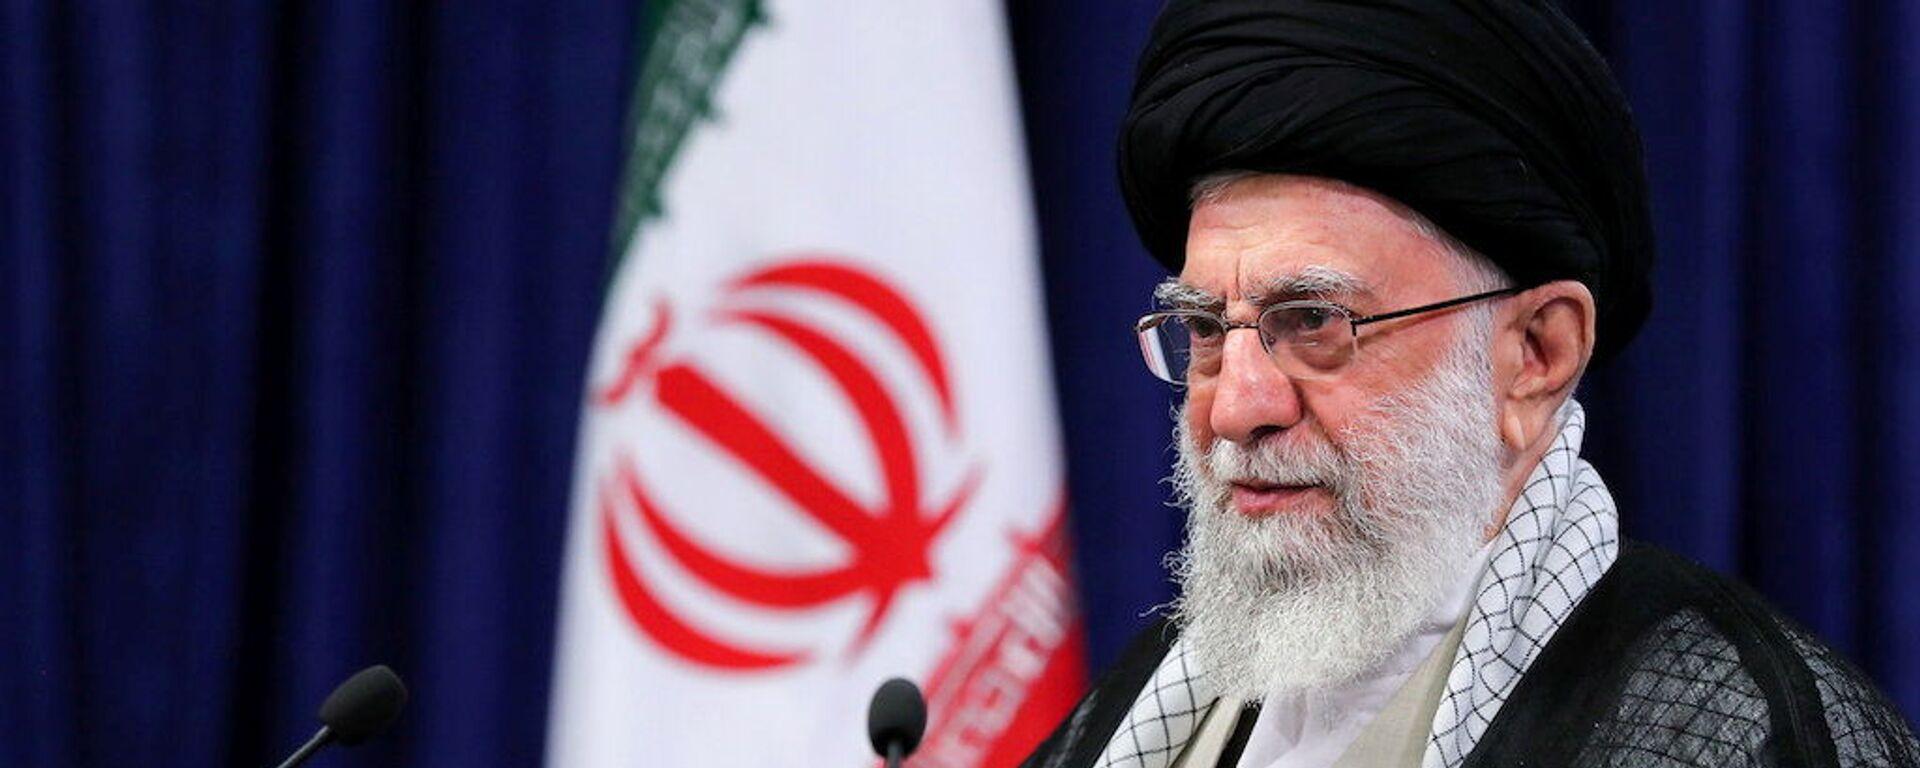 Iran's Supreme Leader Ayatollah Ali Khamenei delivers a televised speech in Tehran, Iran, 4 June 2021.  - Sputnik International, 1920, 28.07.2021